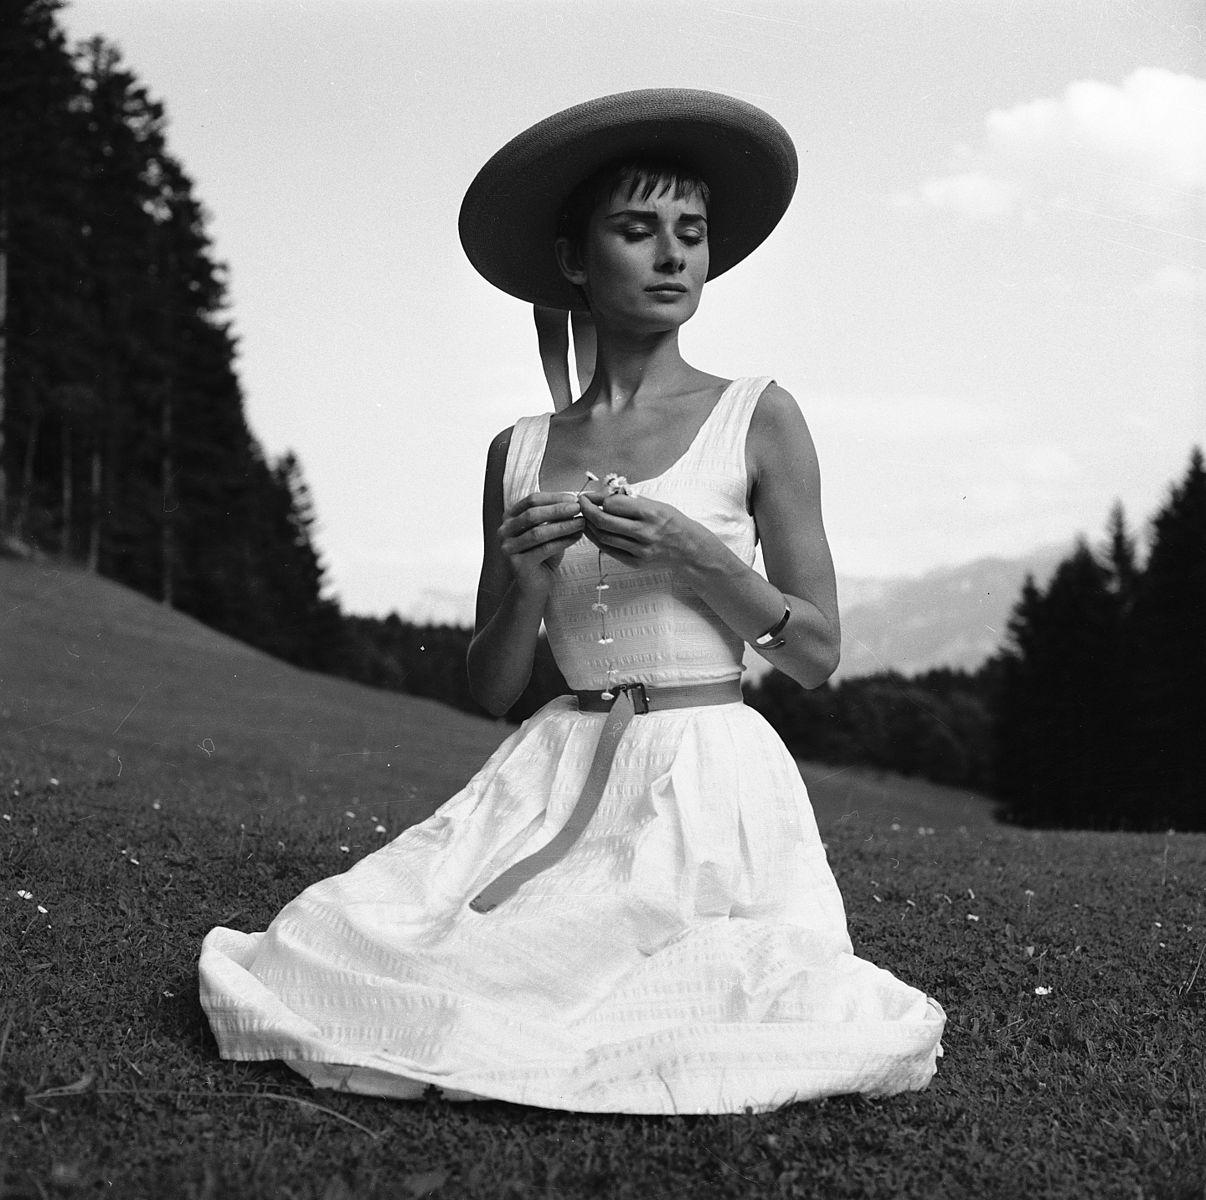 Audrey_Hepburn_auf_dem_Bürgenstock_(12).jpg